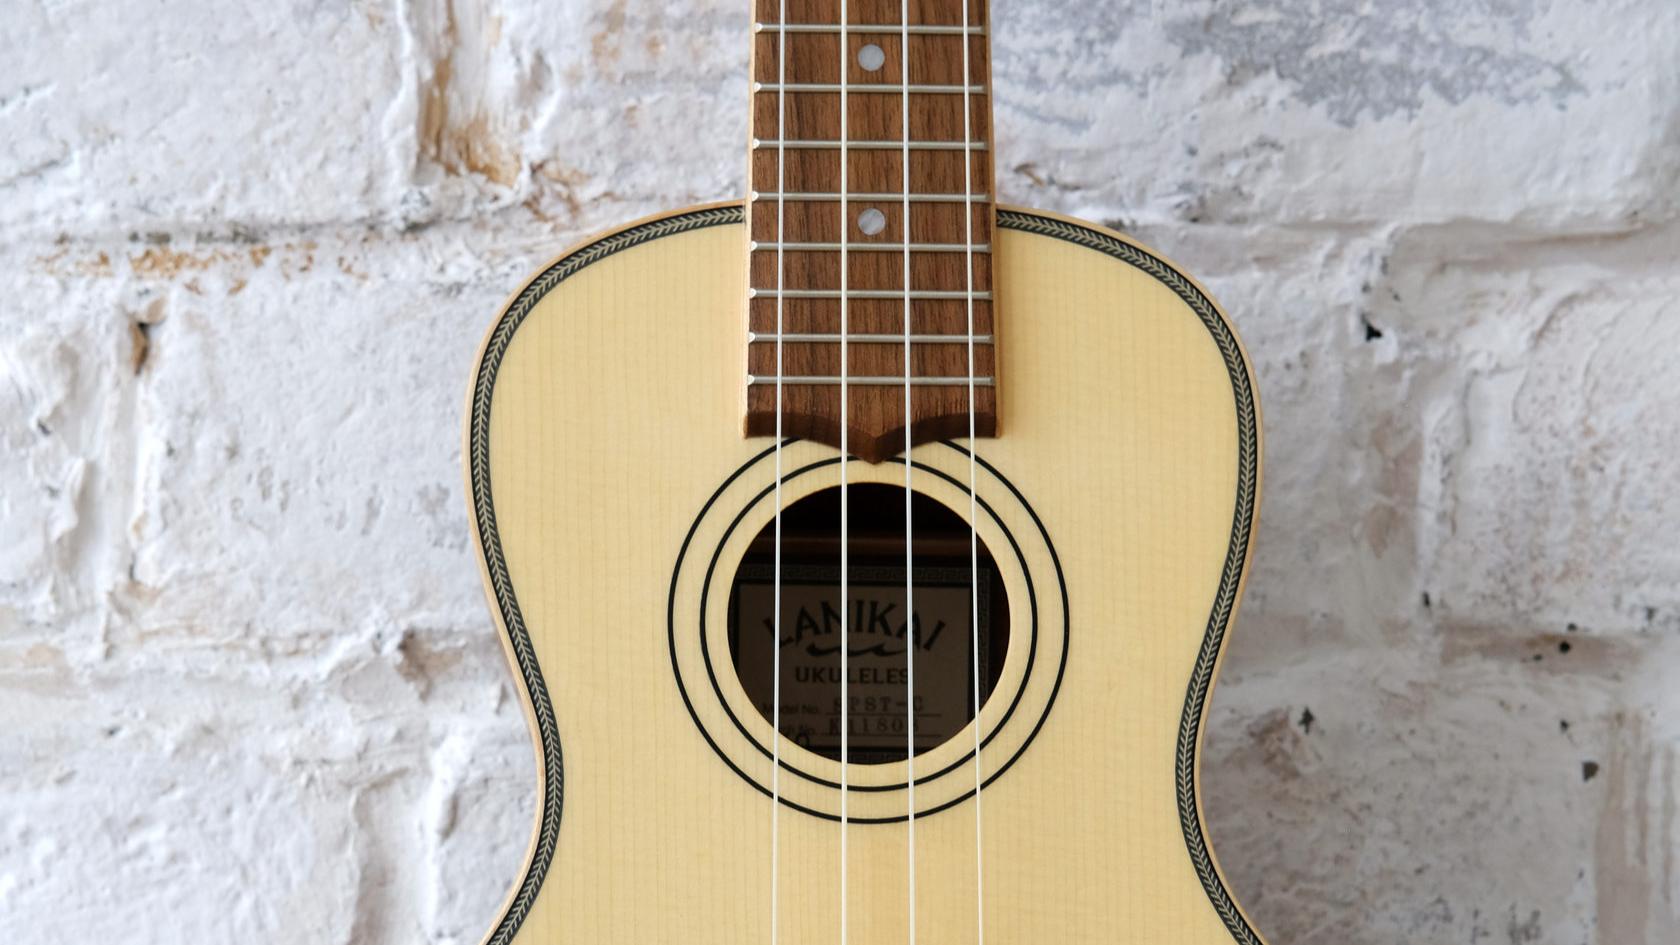 Купить укулеле концерт LANIKAI SPST-C в магазине ukelovers, ukulele LANIKAI